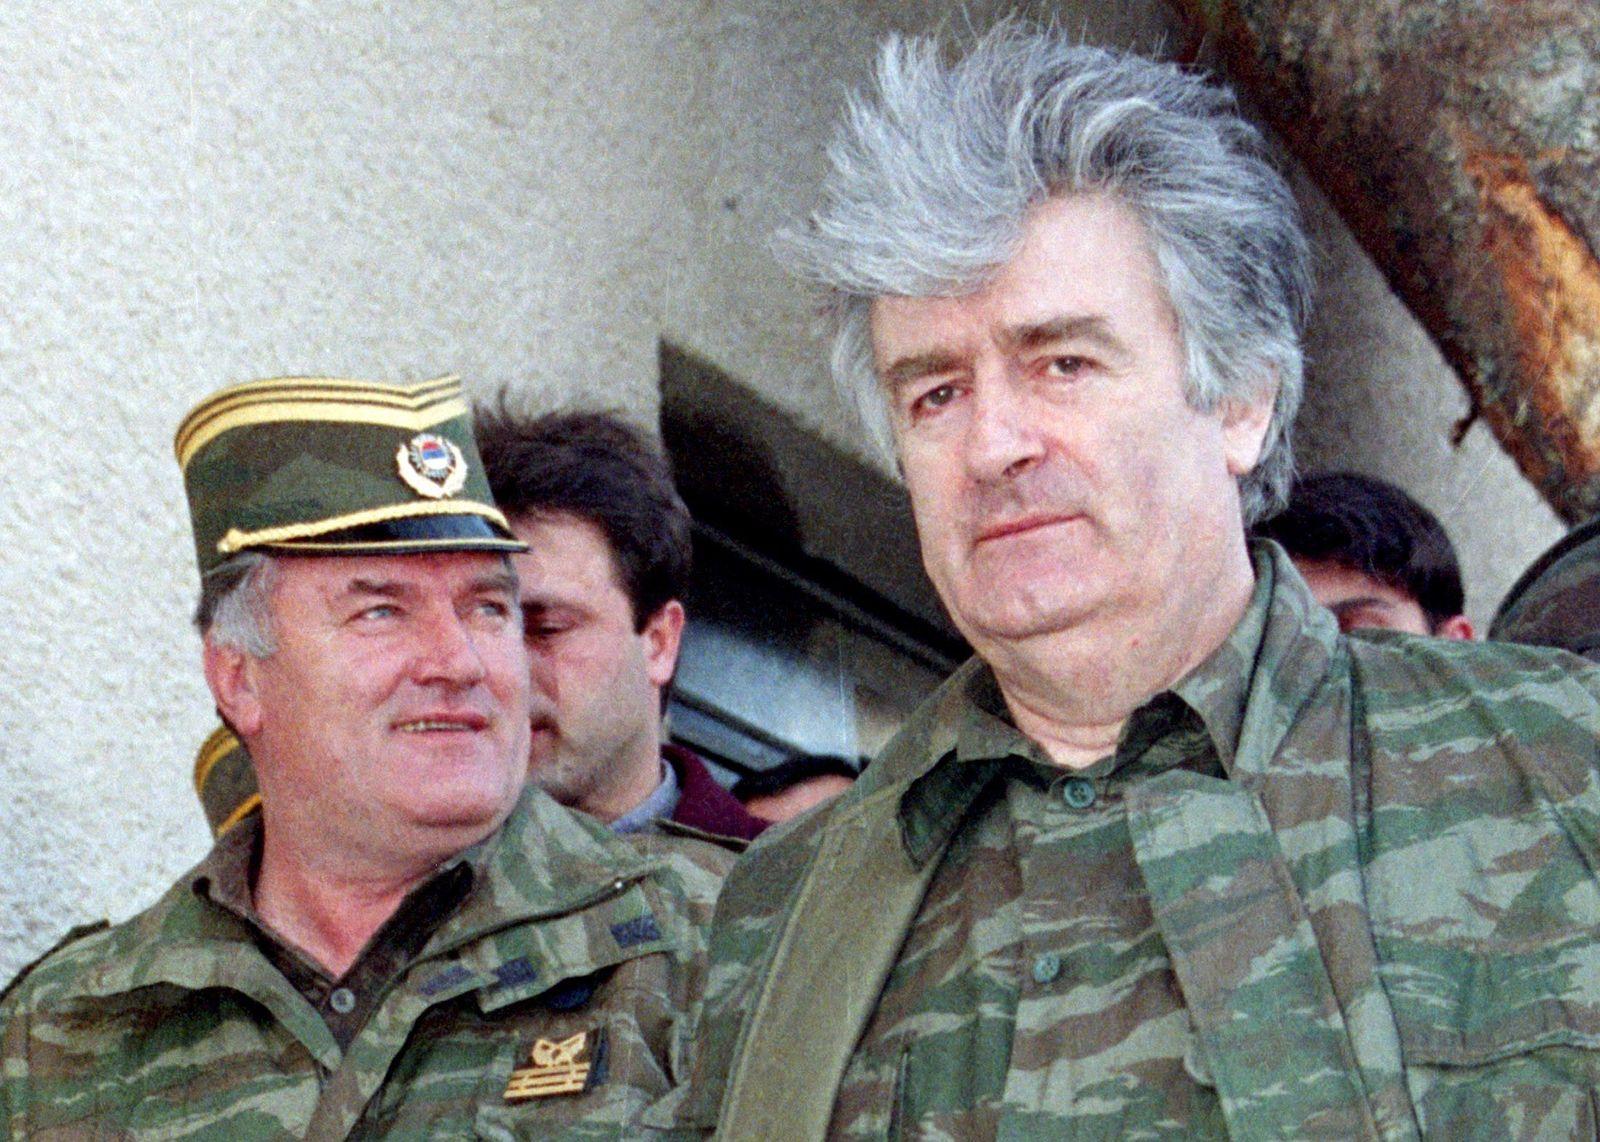 Mladic Karadzic